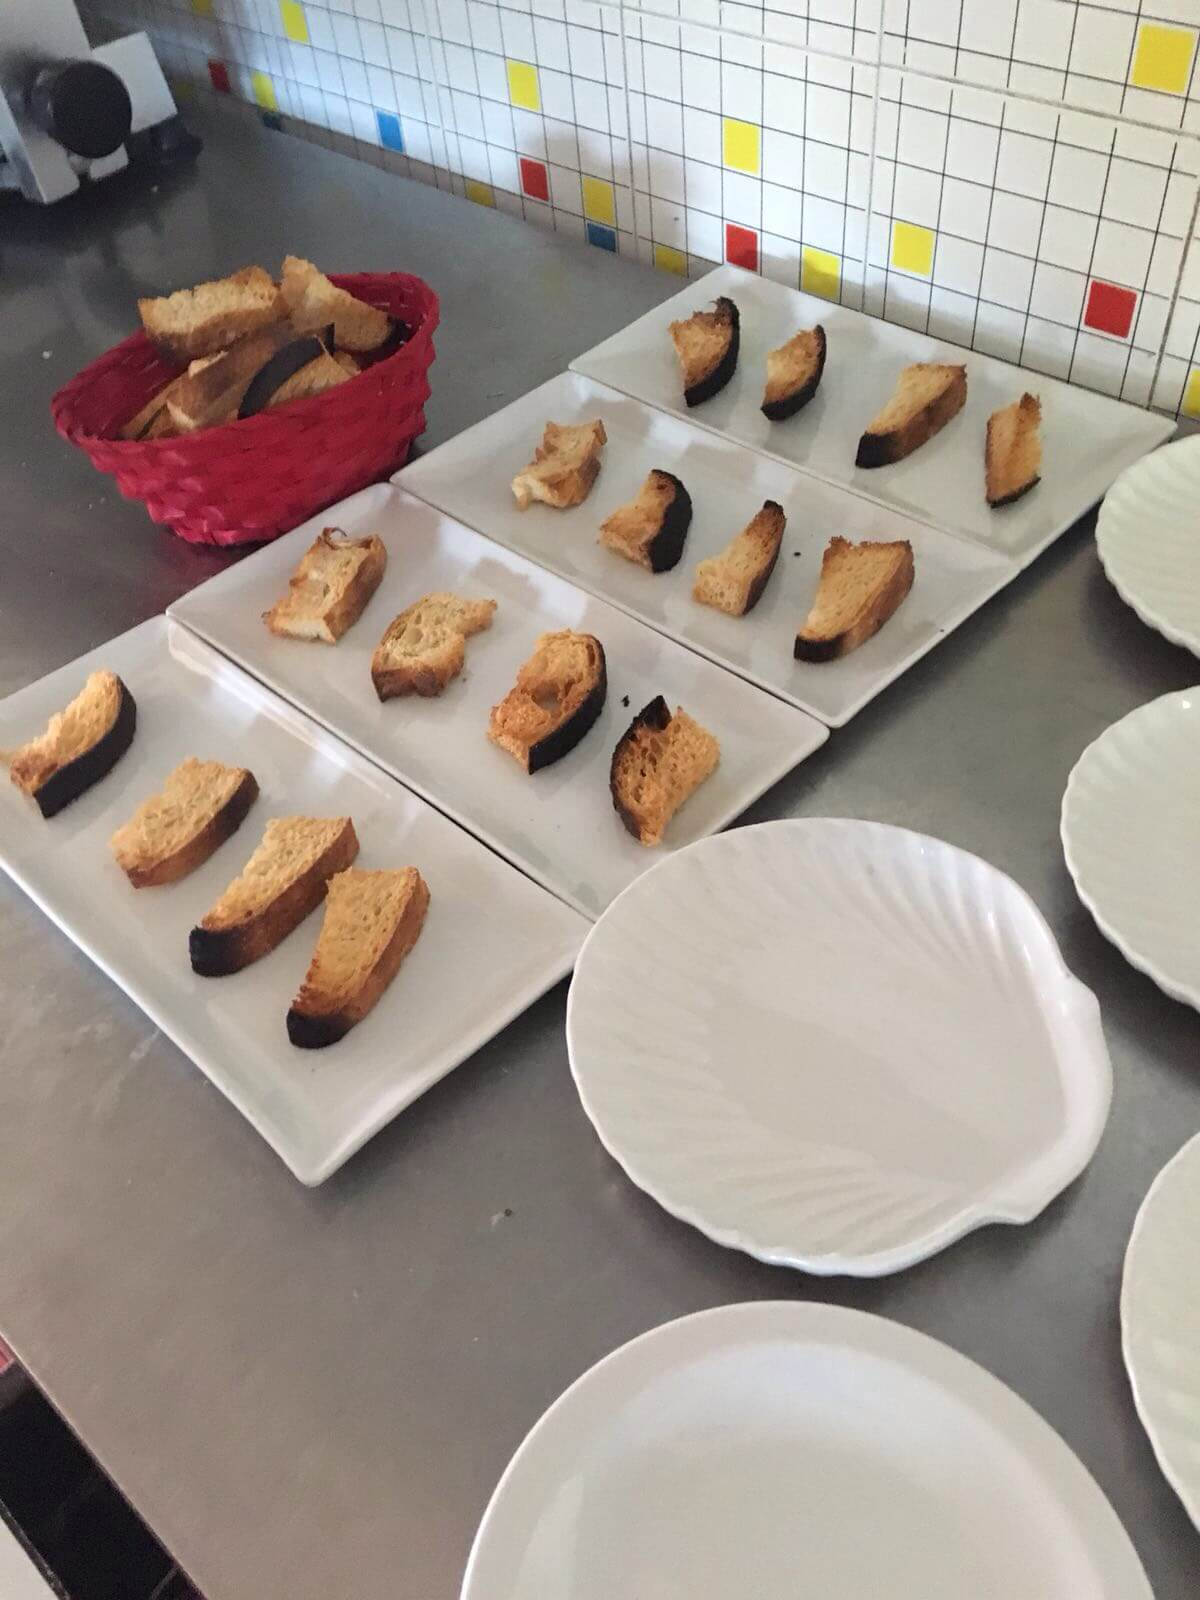 pane abbrustolito su piatti bianchi